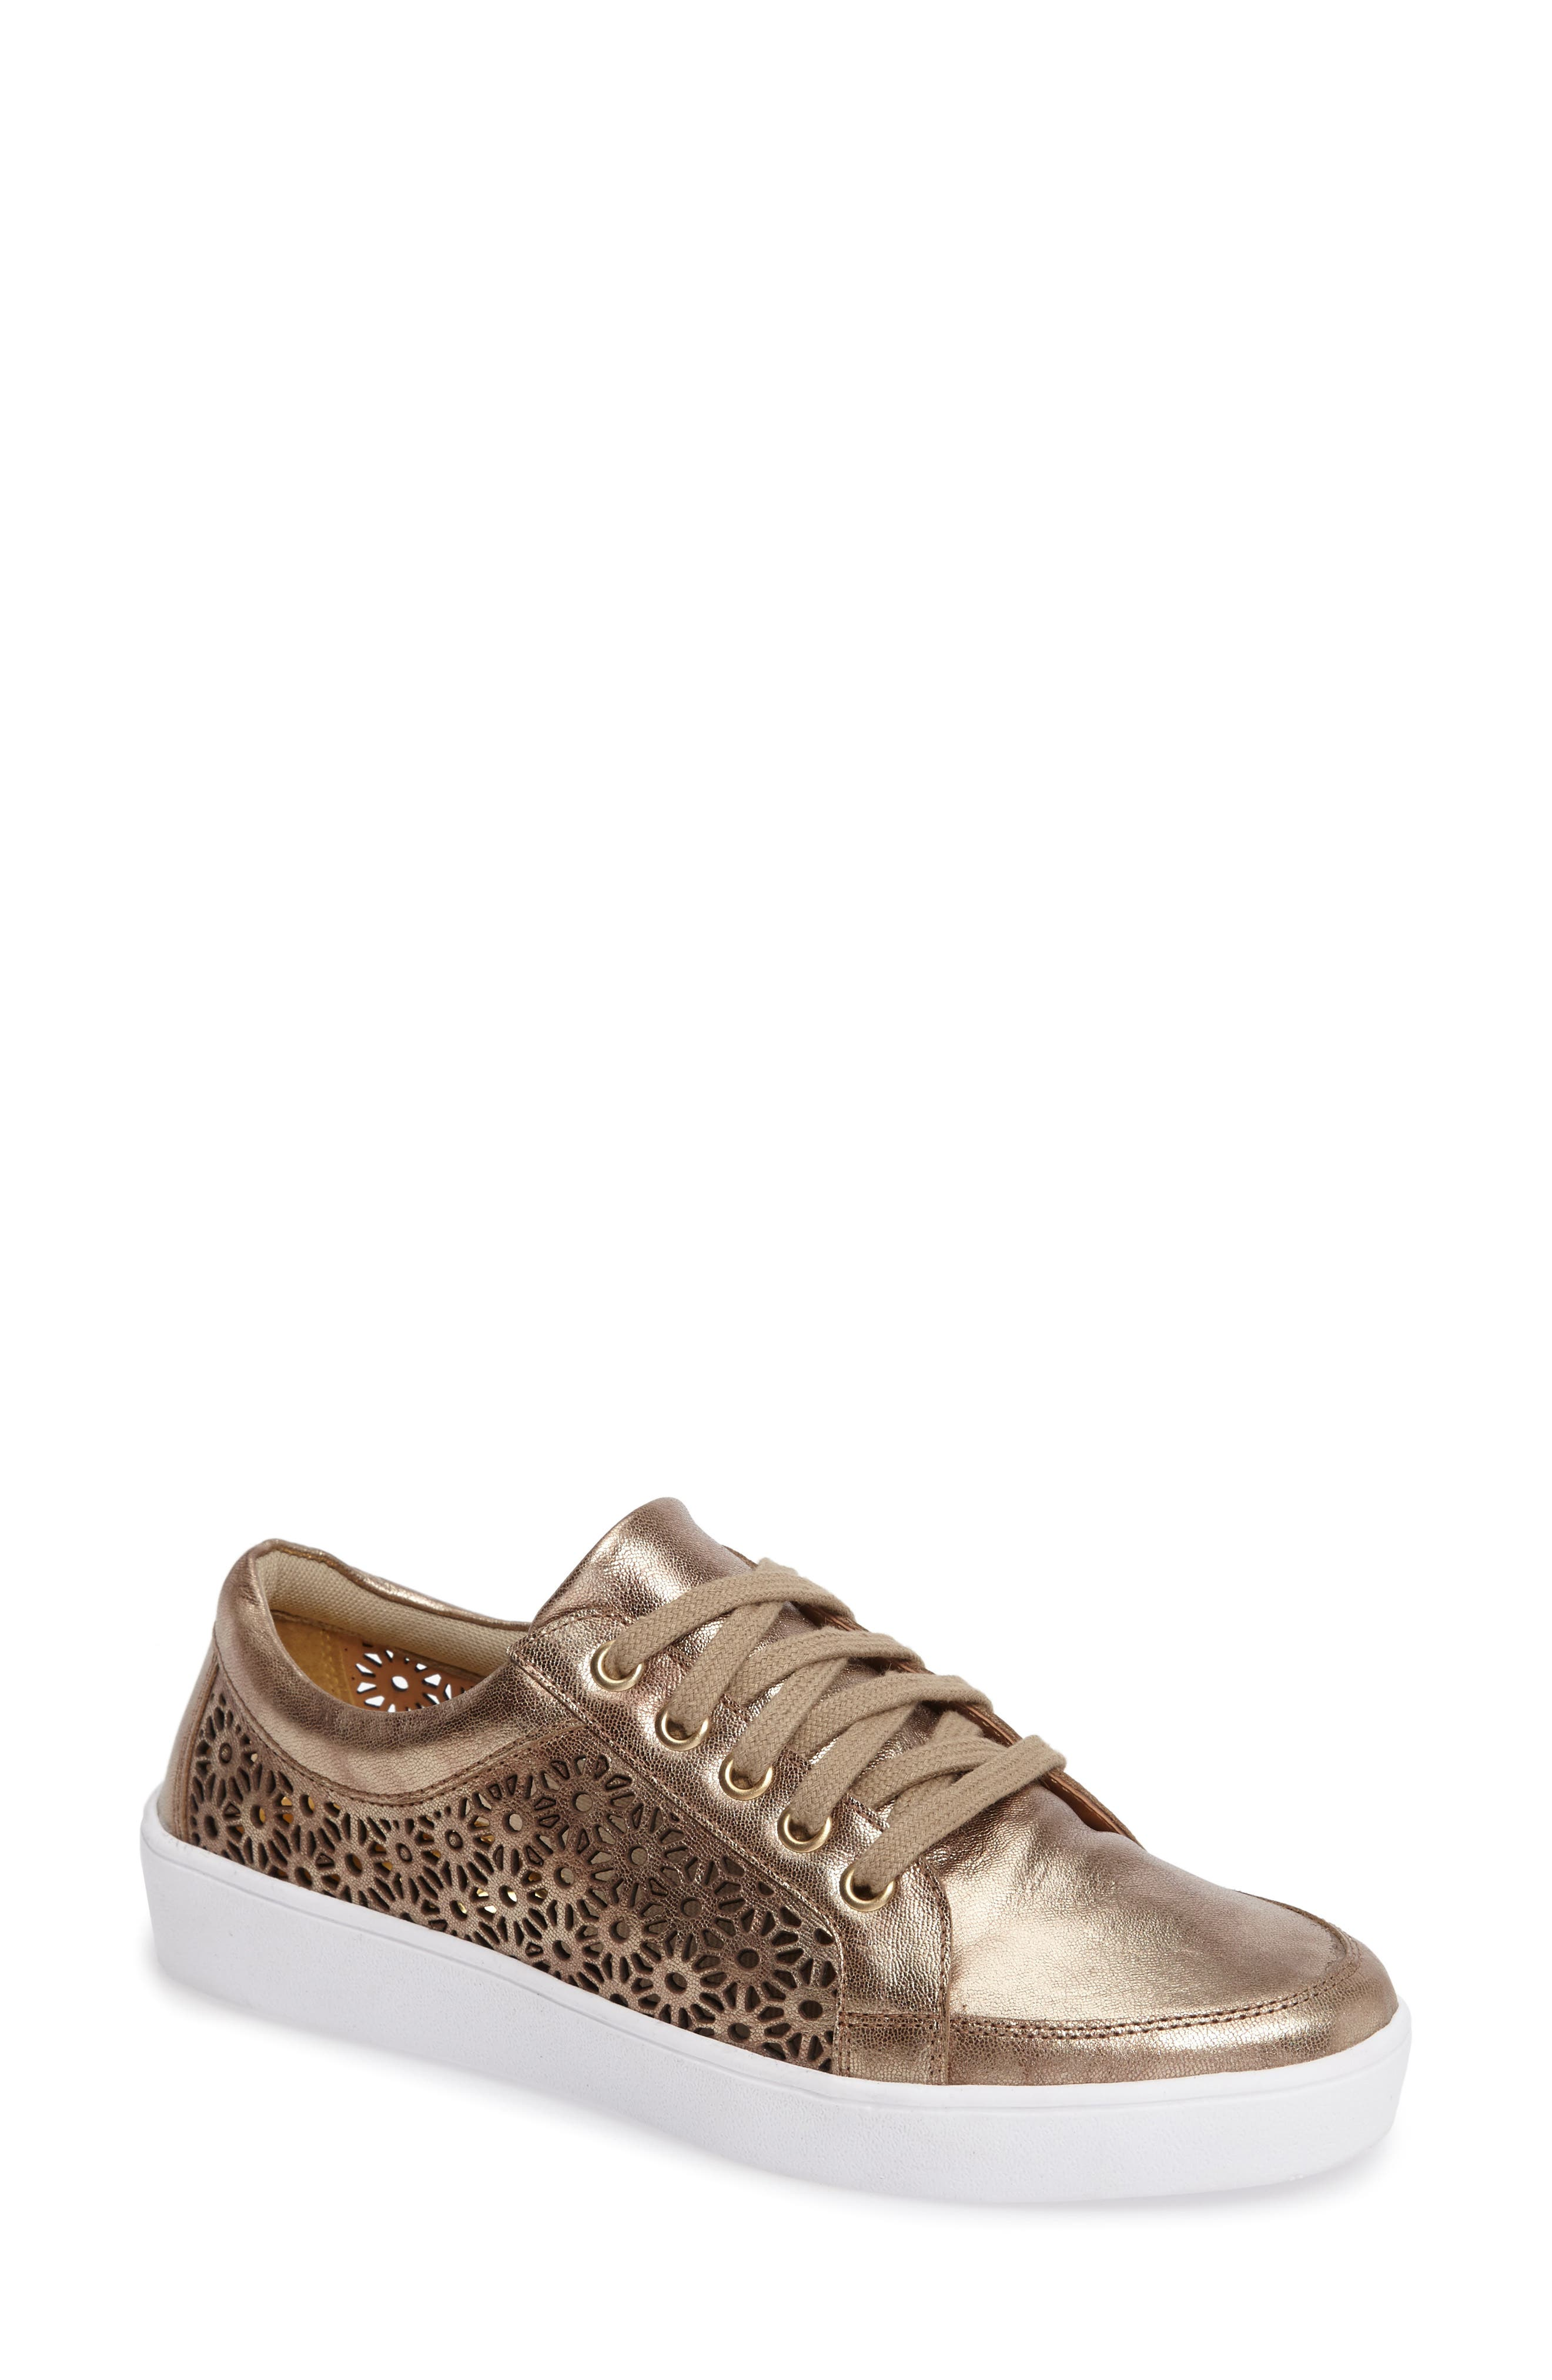 Salena Sneaker,                             Main thumbnail 1, color,                             020